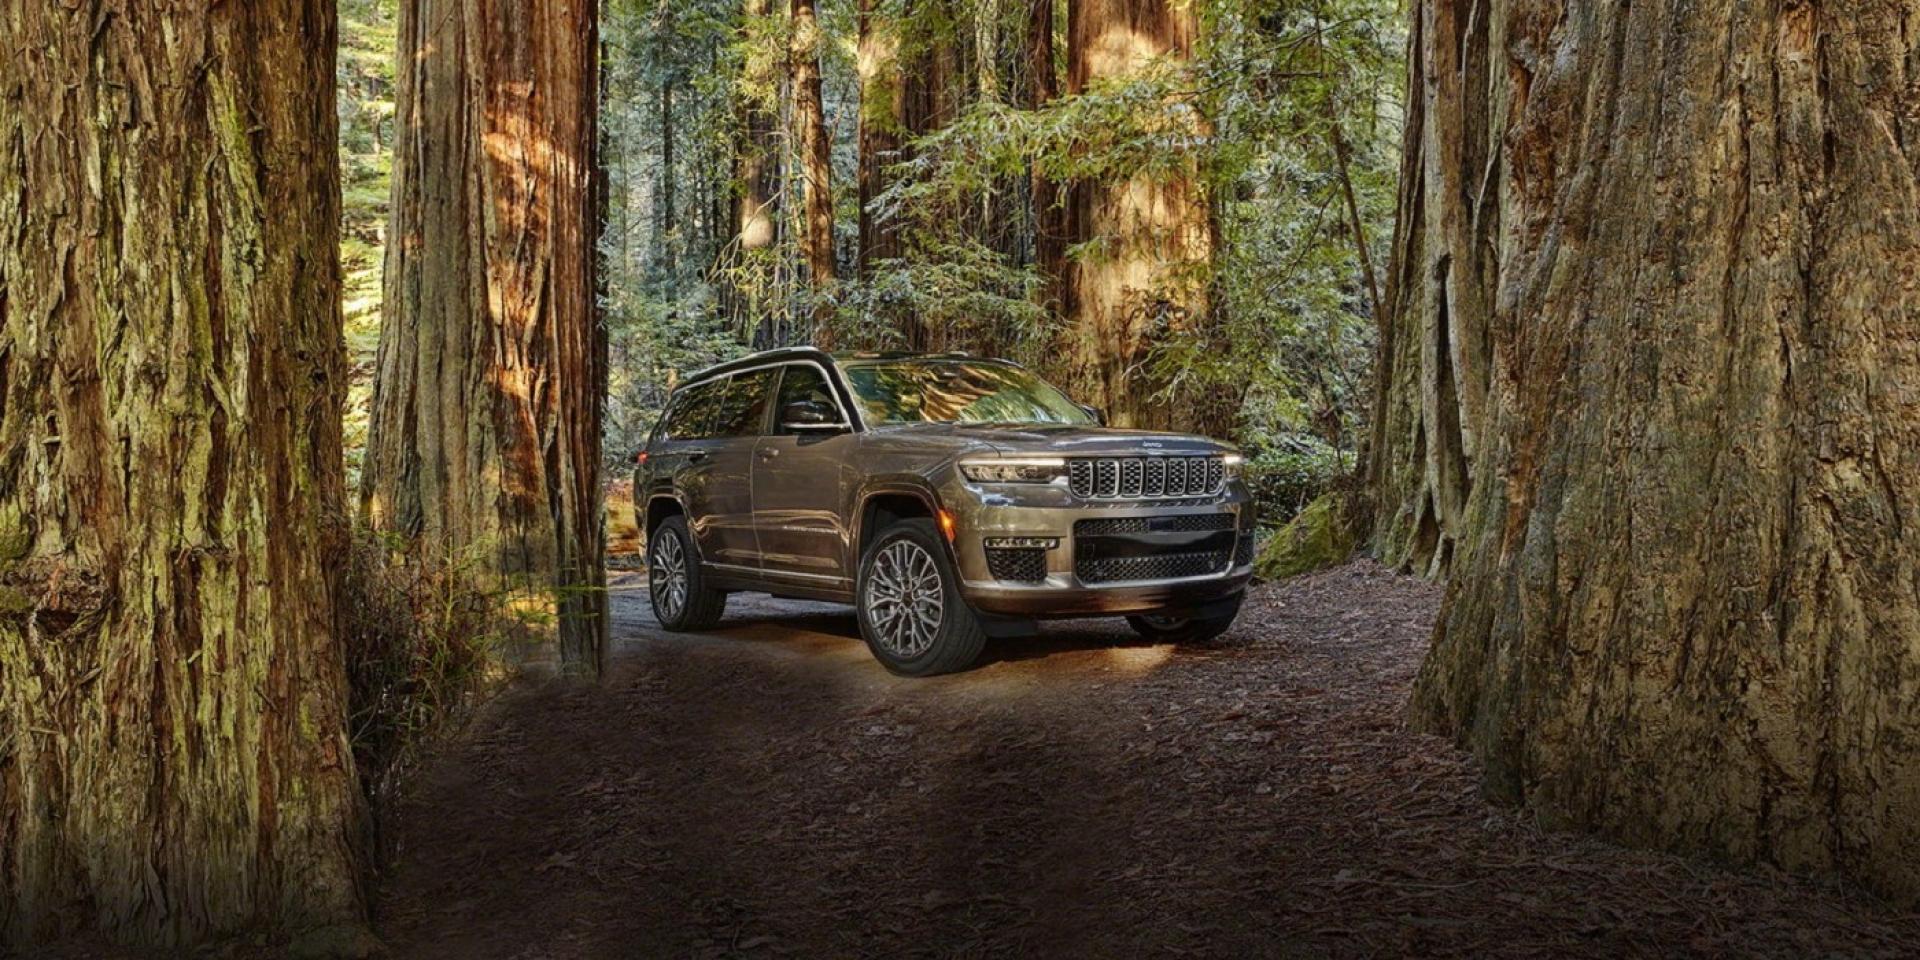 Jeep全尺寸豪華休旅車Grand Cherokee L,展現品牌科技感